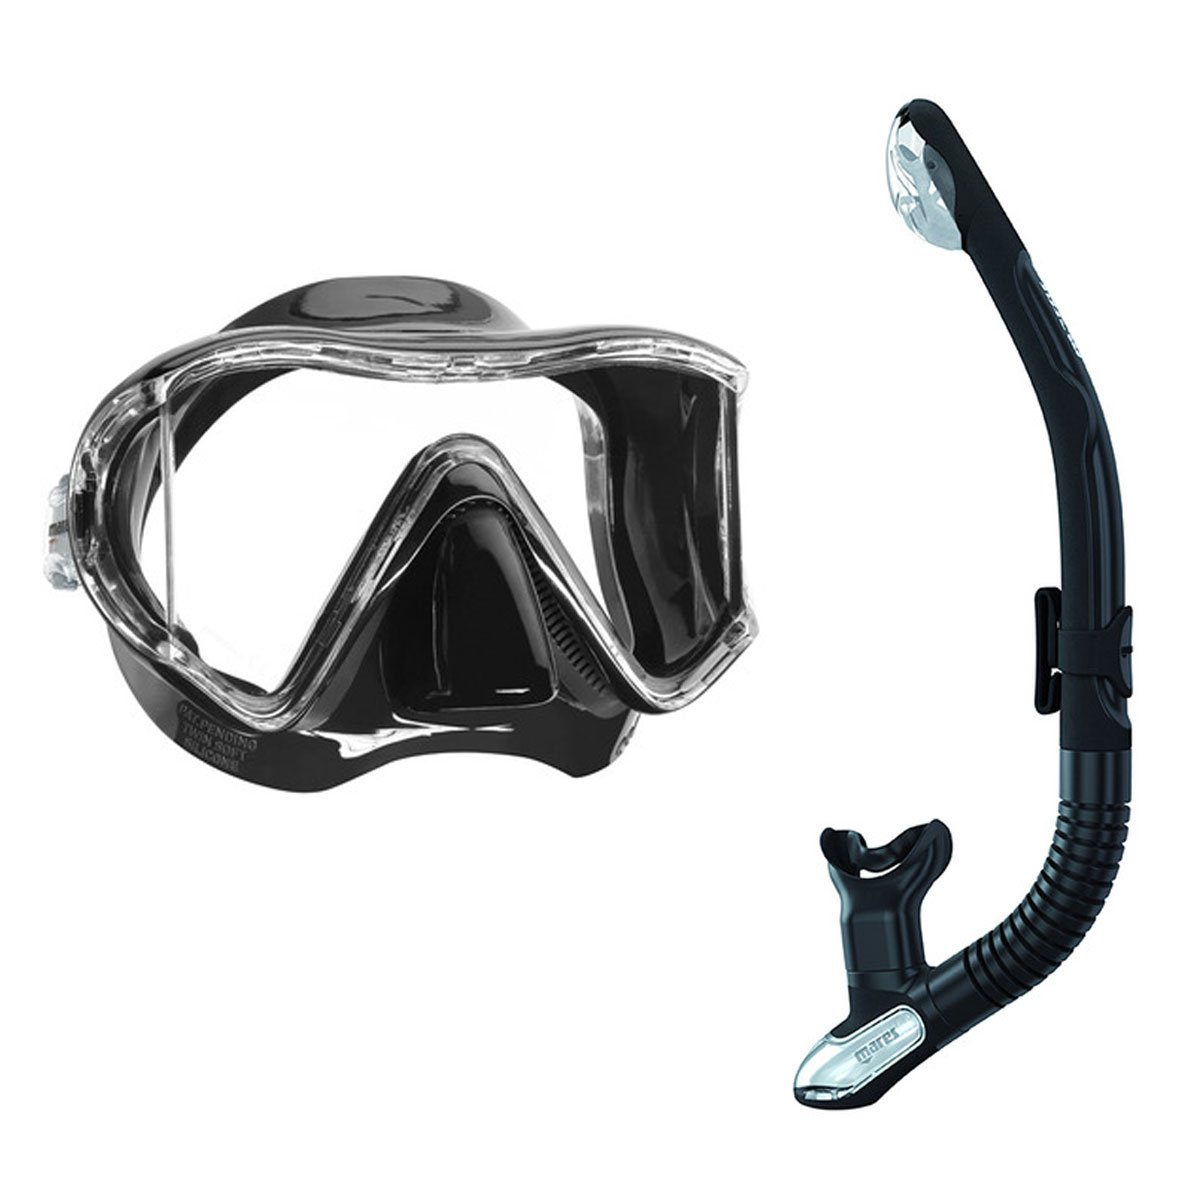 Ergo Dry Trockenschnorchel Mares i3 Einglasmaske Tauchermaske